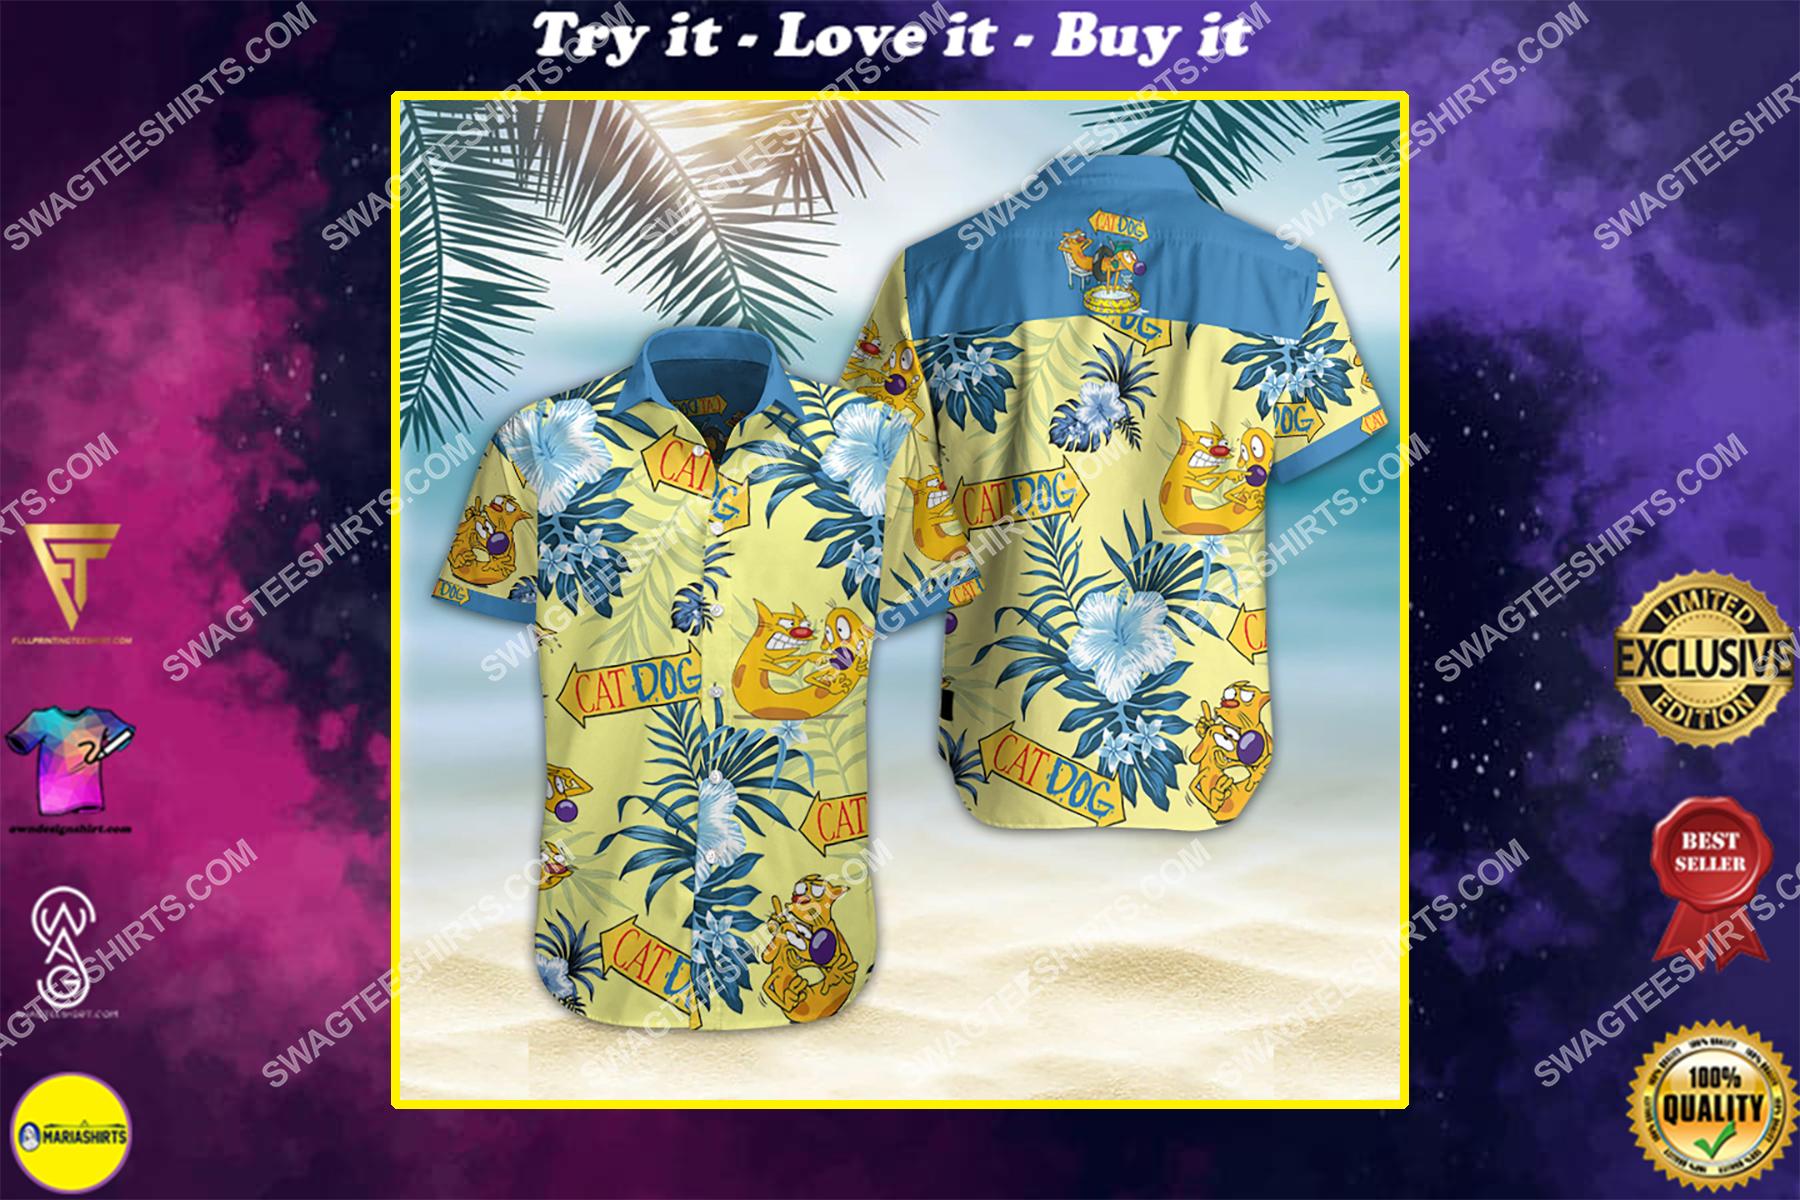 catdog movie all over print hawaiian shirt